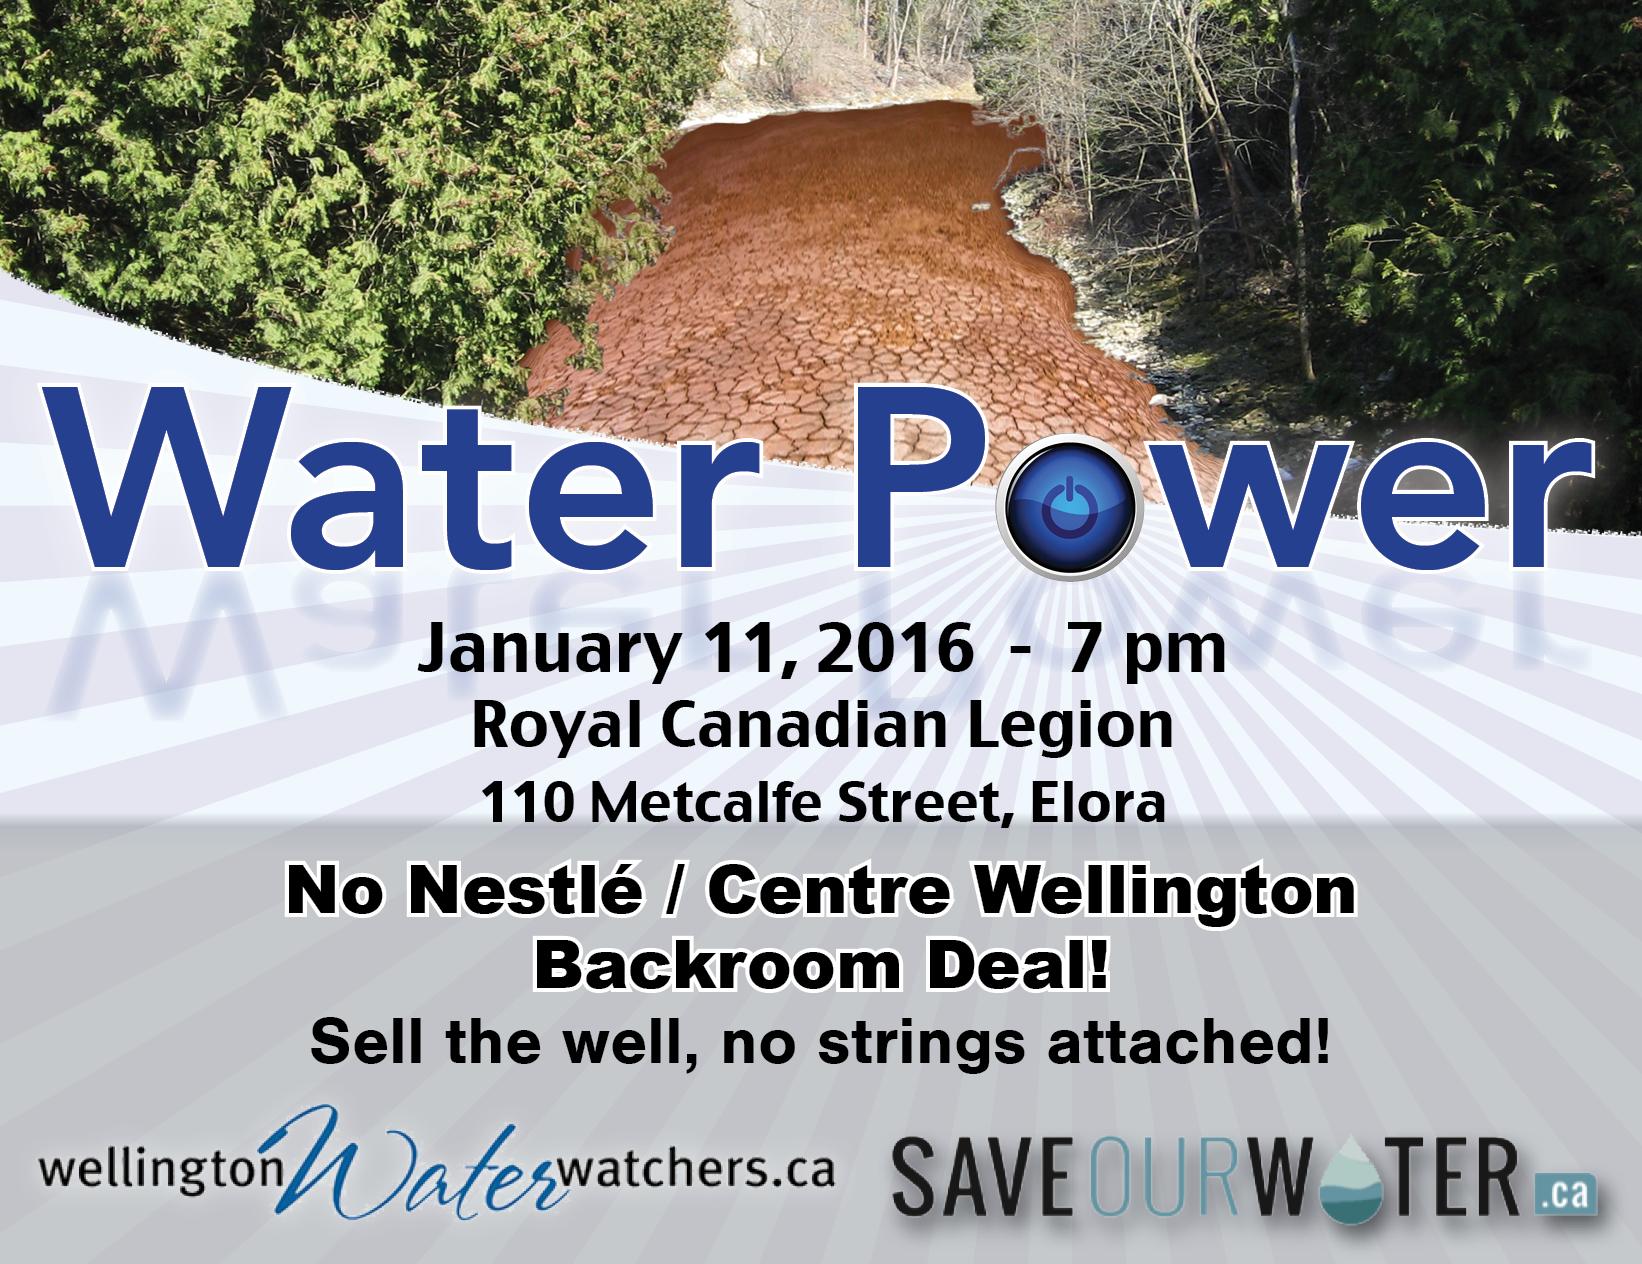 water_power_postcard_Jan_11_2017.jpg